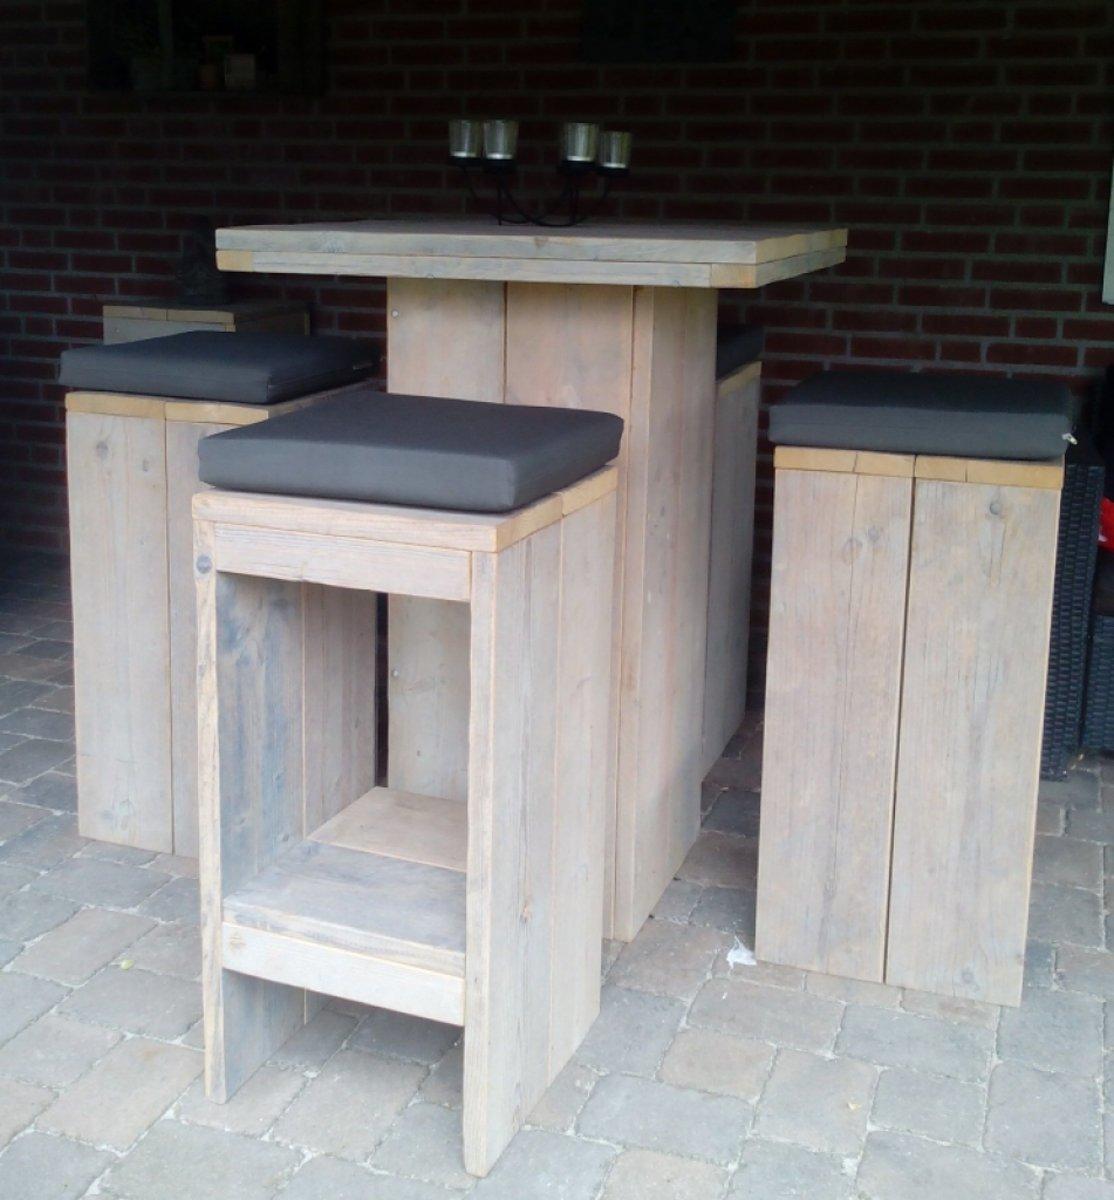 Hoge tafel met barkrukken buiten tuinmeubelen terrasmeubelen ikea barkruk curitiba grijs leen - Ontwerp terrasmeubelen ...